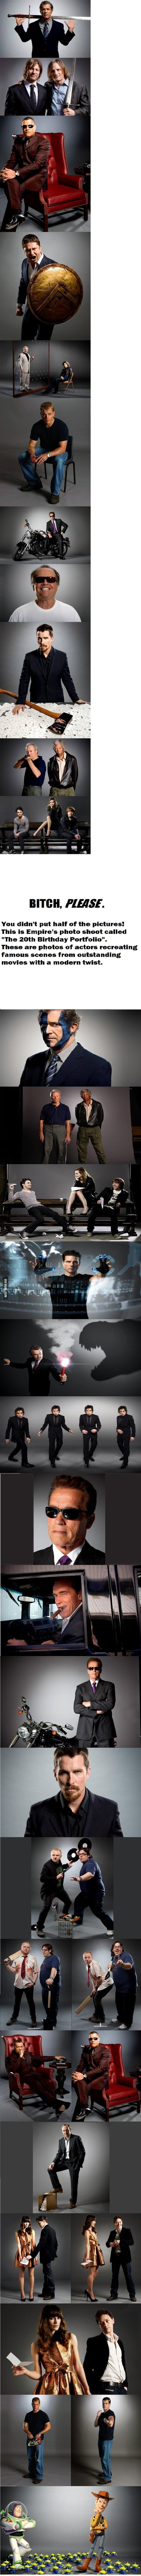 Famous actors recreating iconic roles [Fixd]